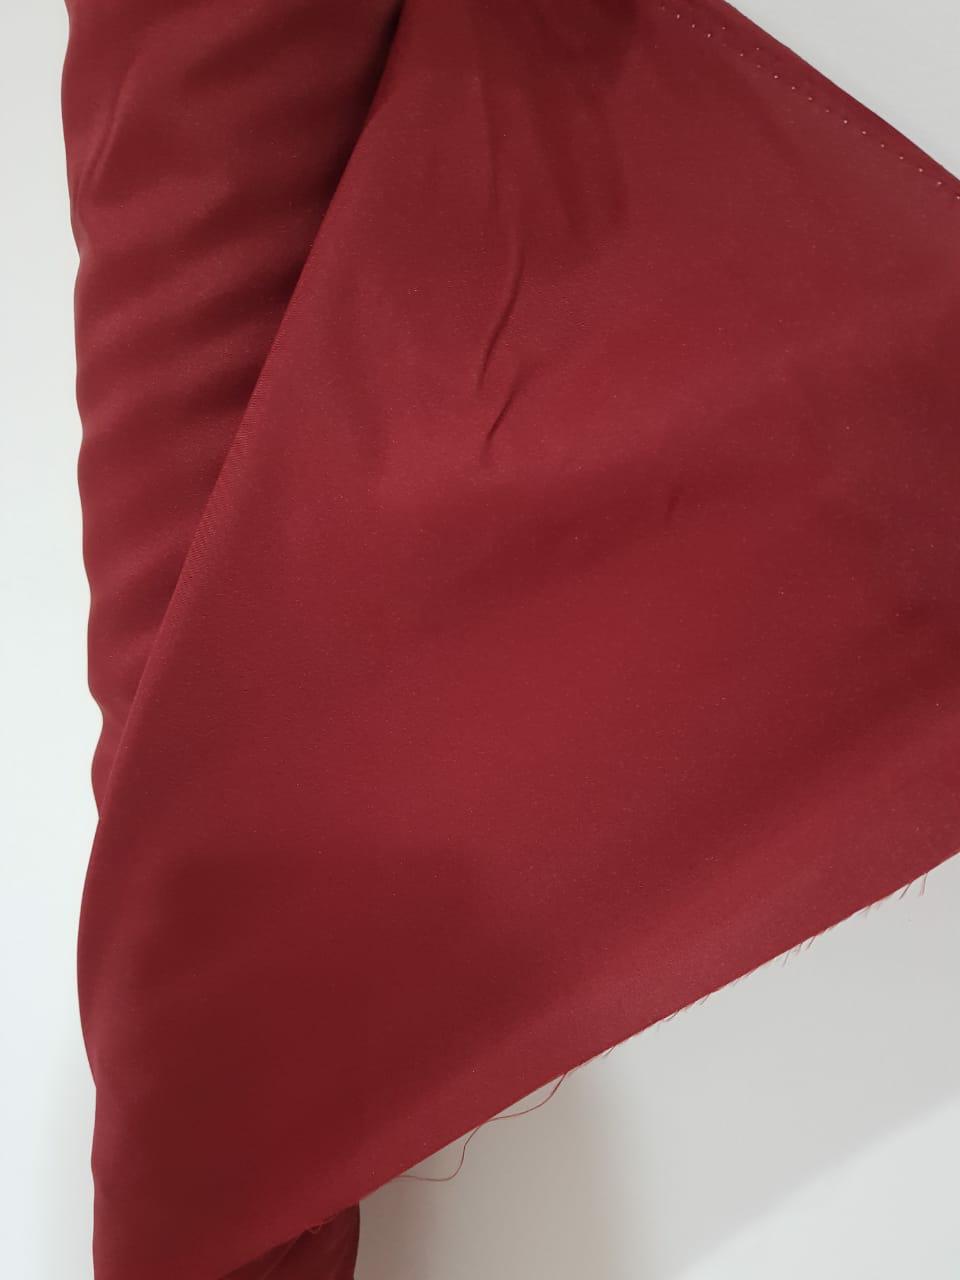 Jual Asahi Panjang Kahatex Lebar Kain155cm Kain Furing Tokopedia